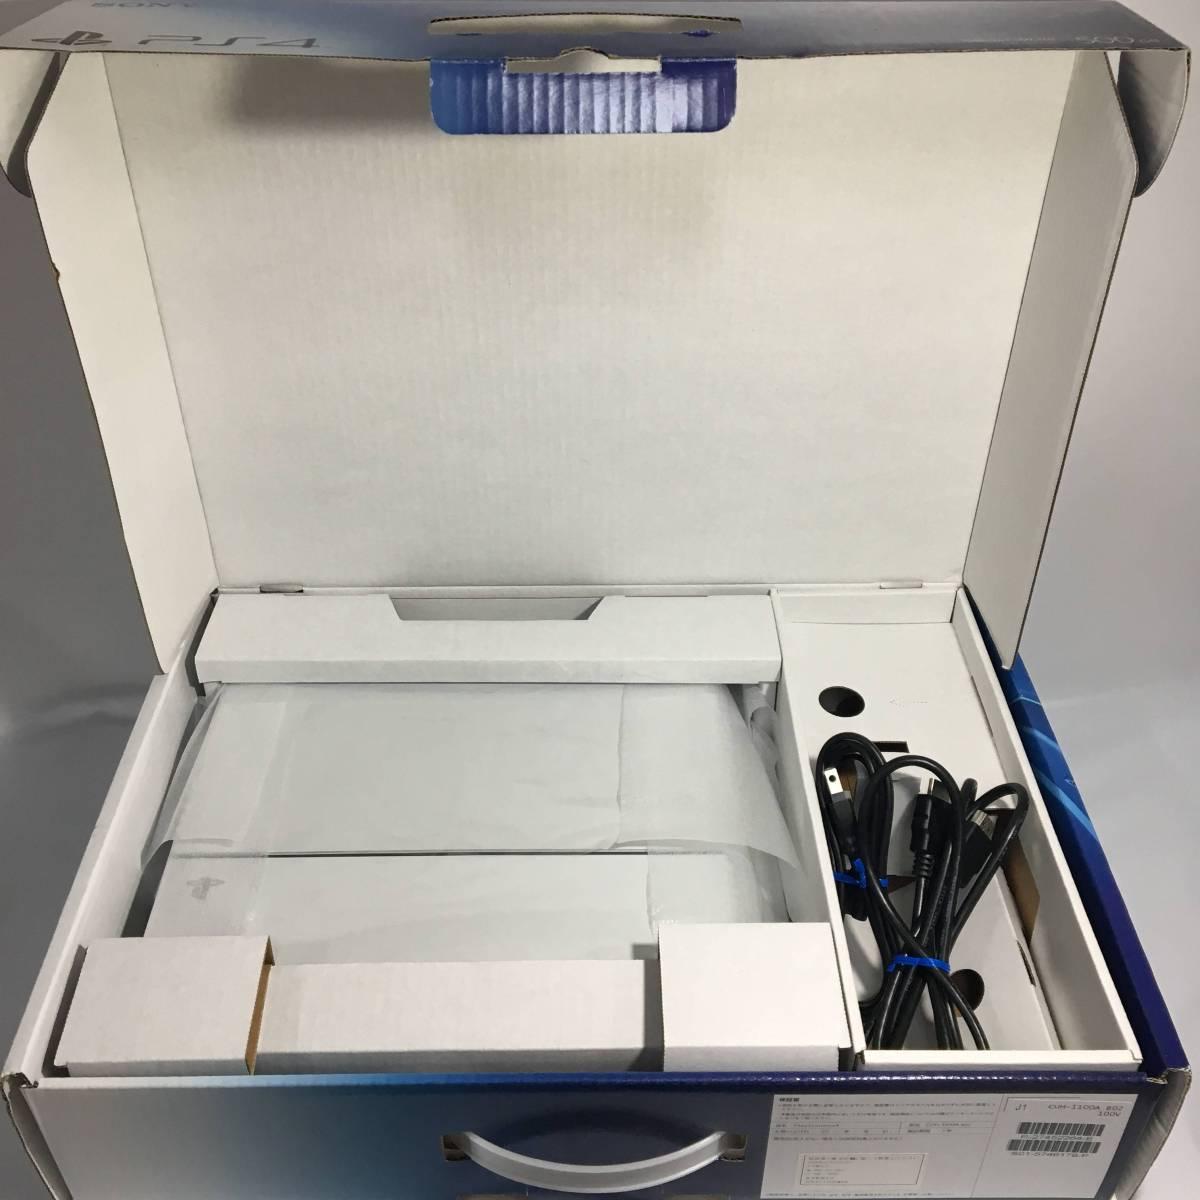 PS4 プレイステーション4 CUH-1100A 500GB 本体 ケーブルセット ホワイト 白 まとめ ソニー ソフト プレステ 中古 Pro VR_画像2